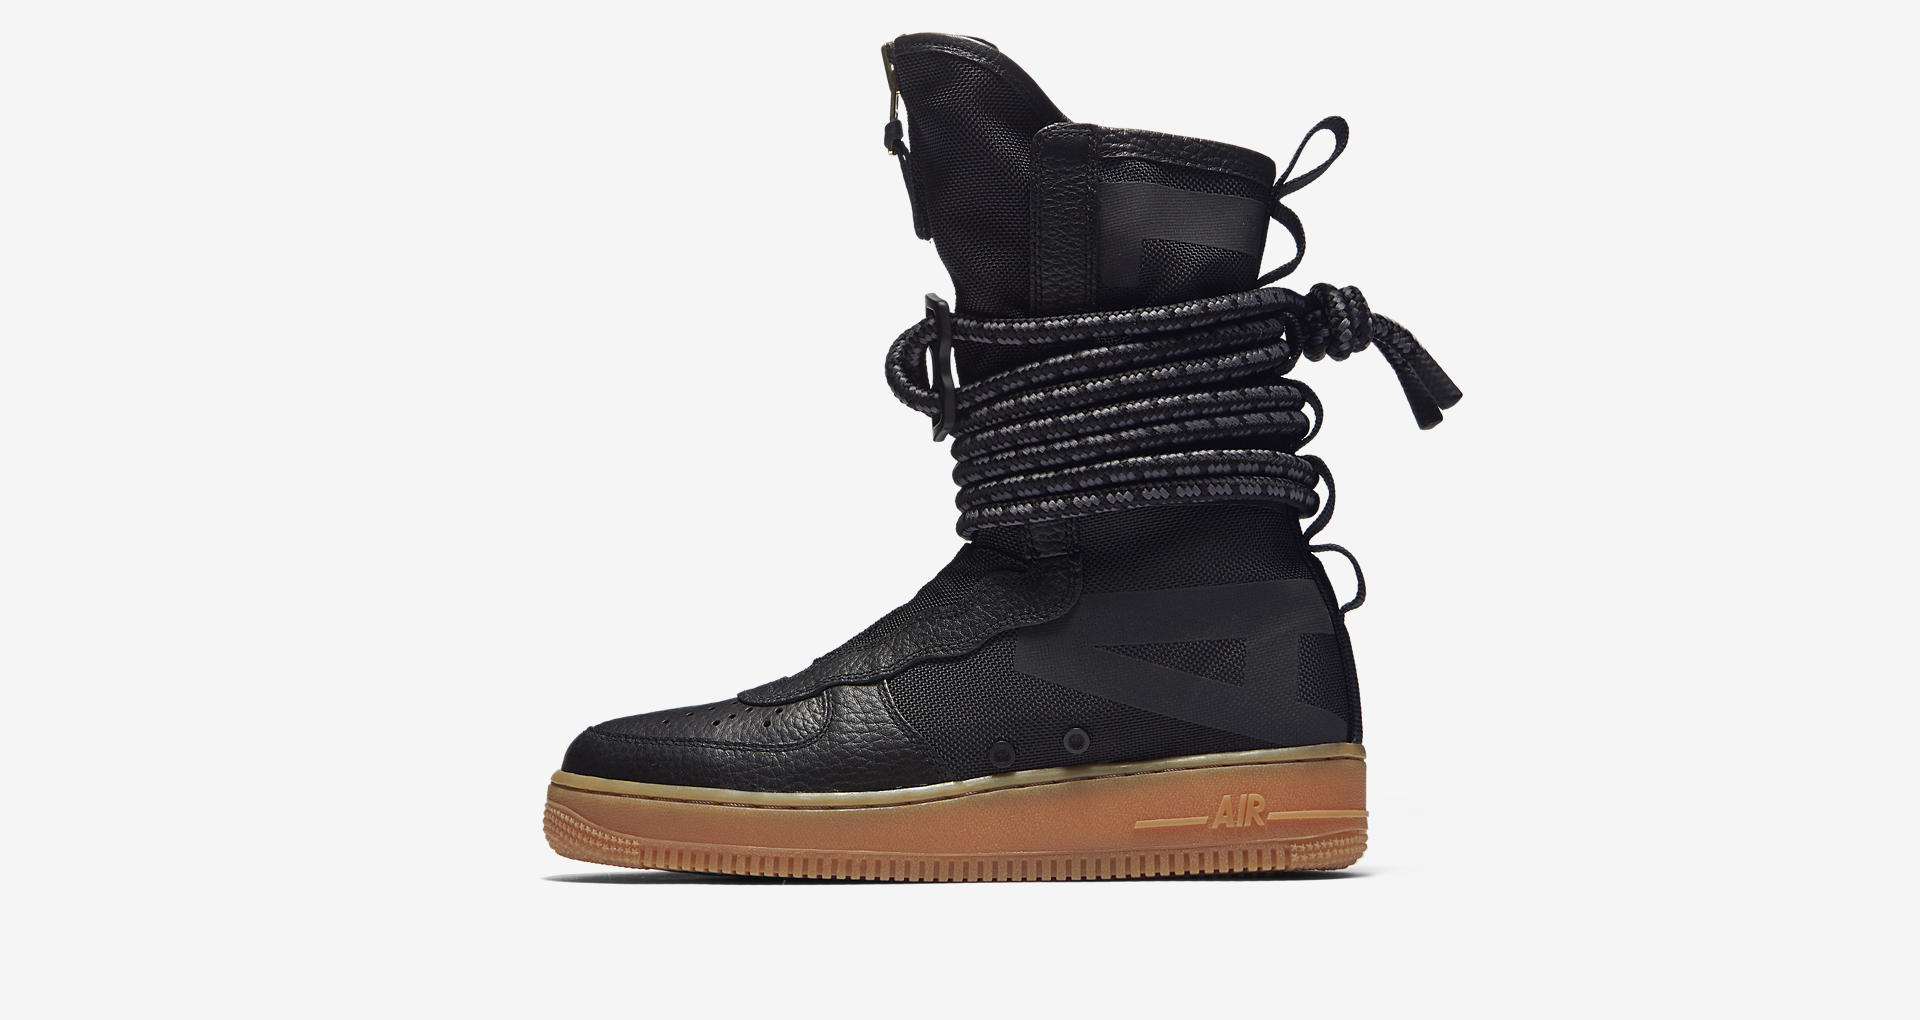 low priced a5b65 f4a55 nike SF AF1 high black gum medium zipper womens 1 - WearTesters